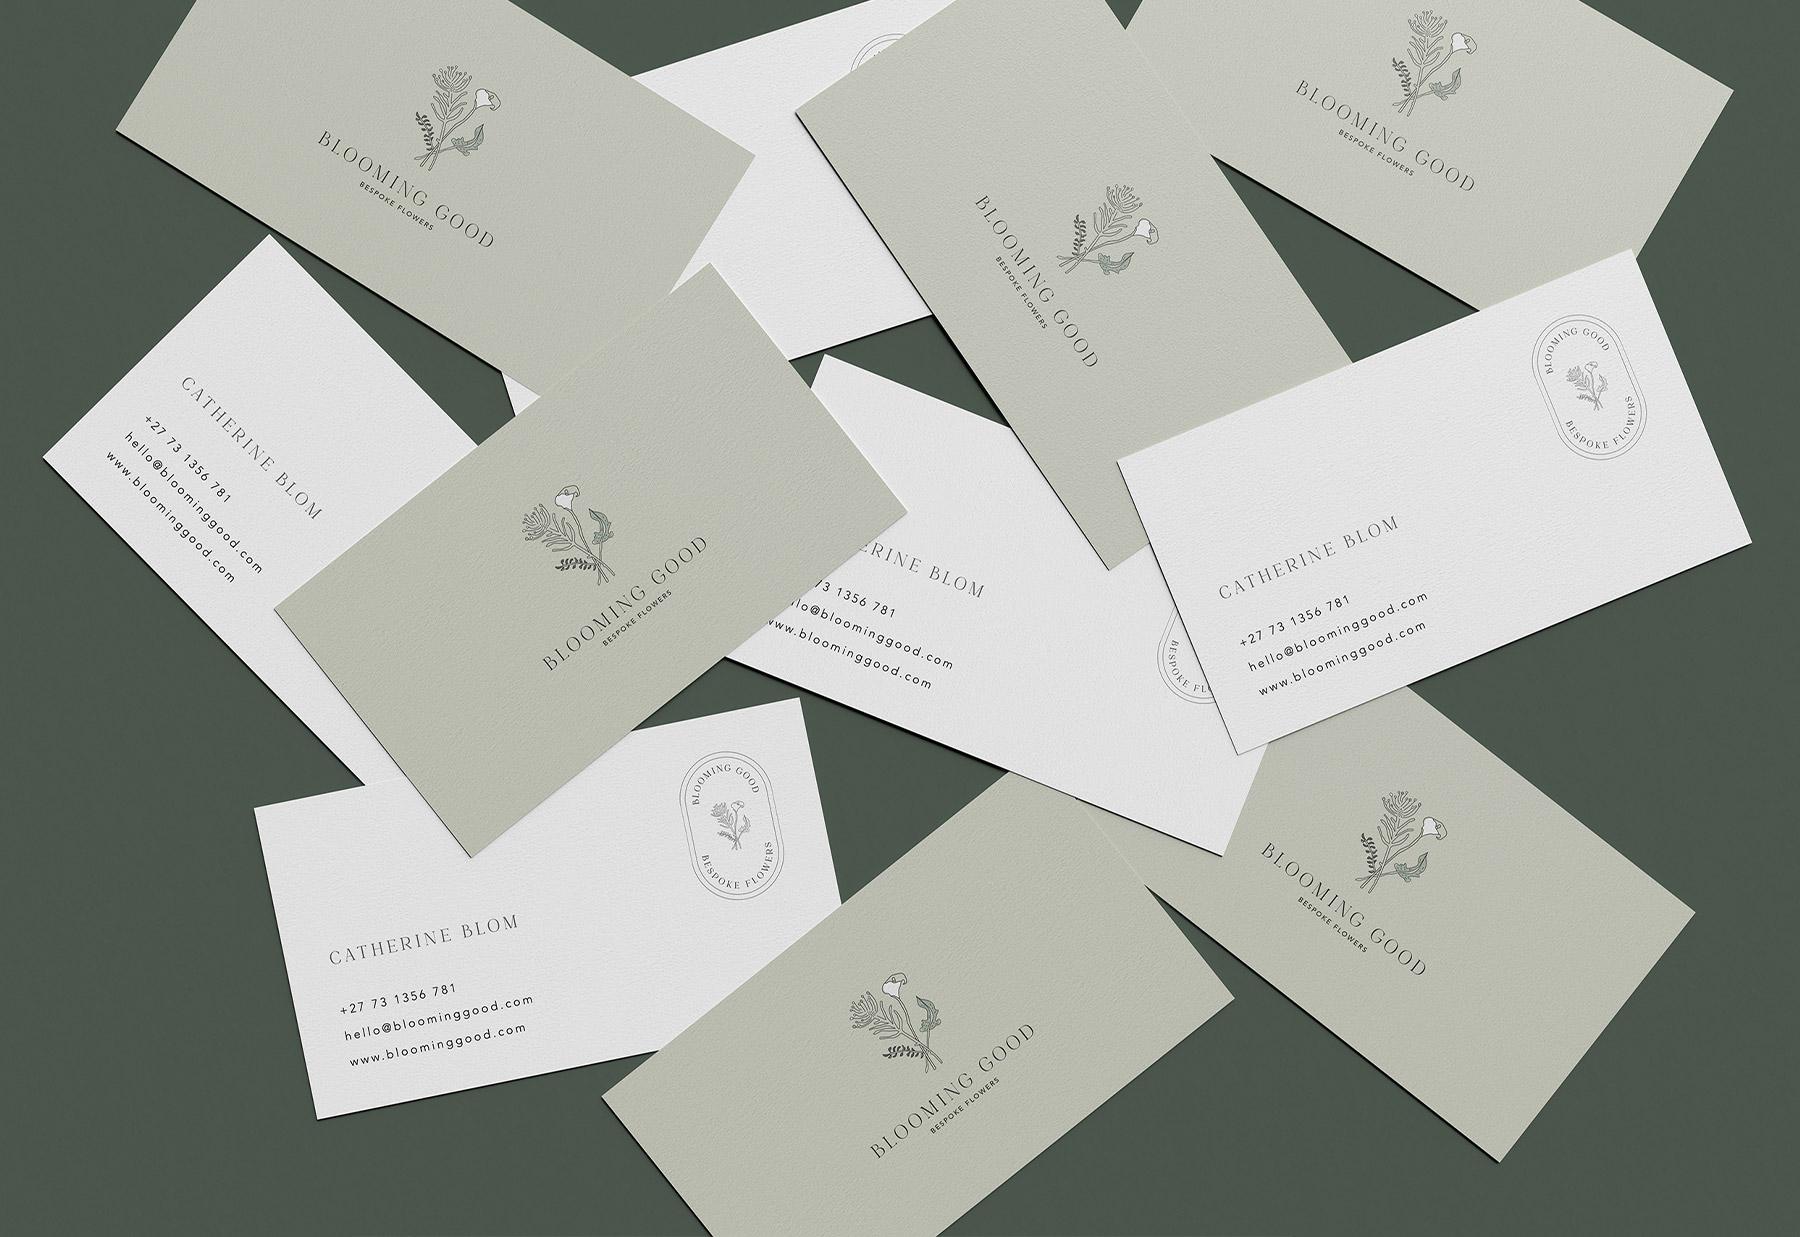 Business card design for bespoke flower studio, Blooming Good